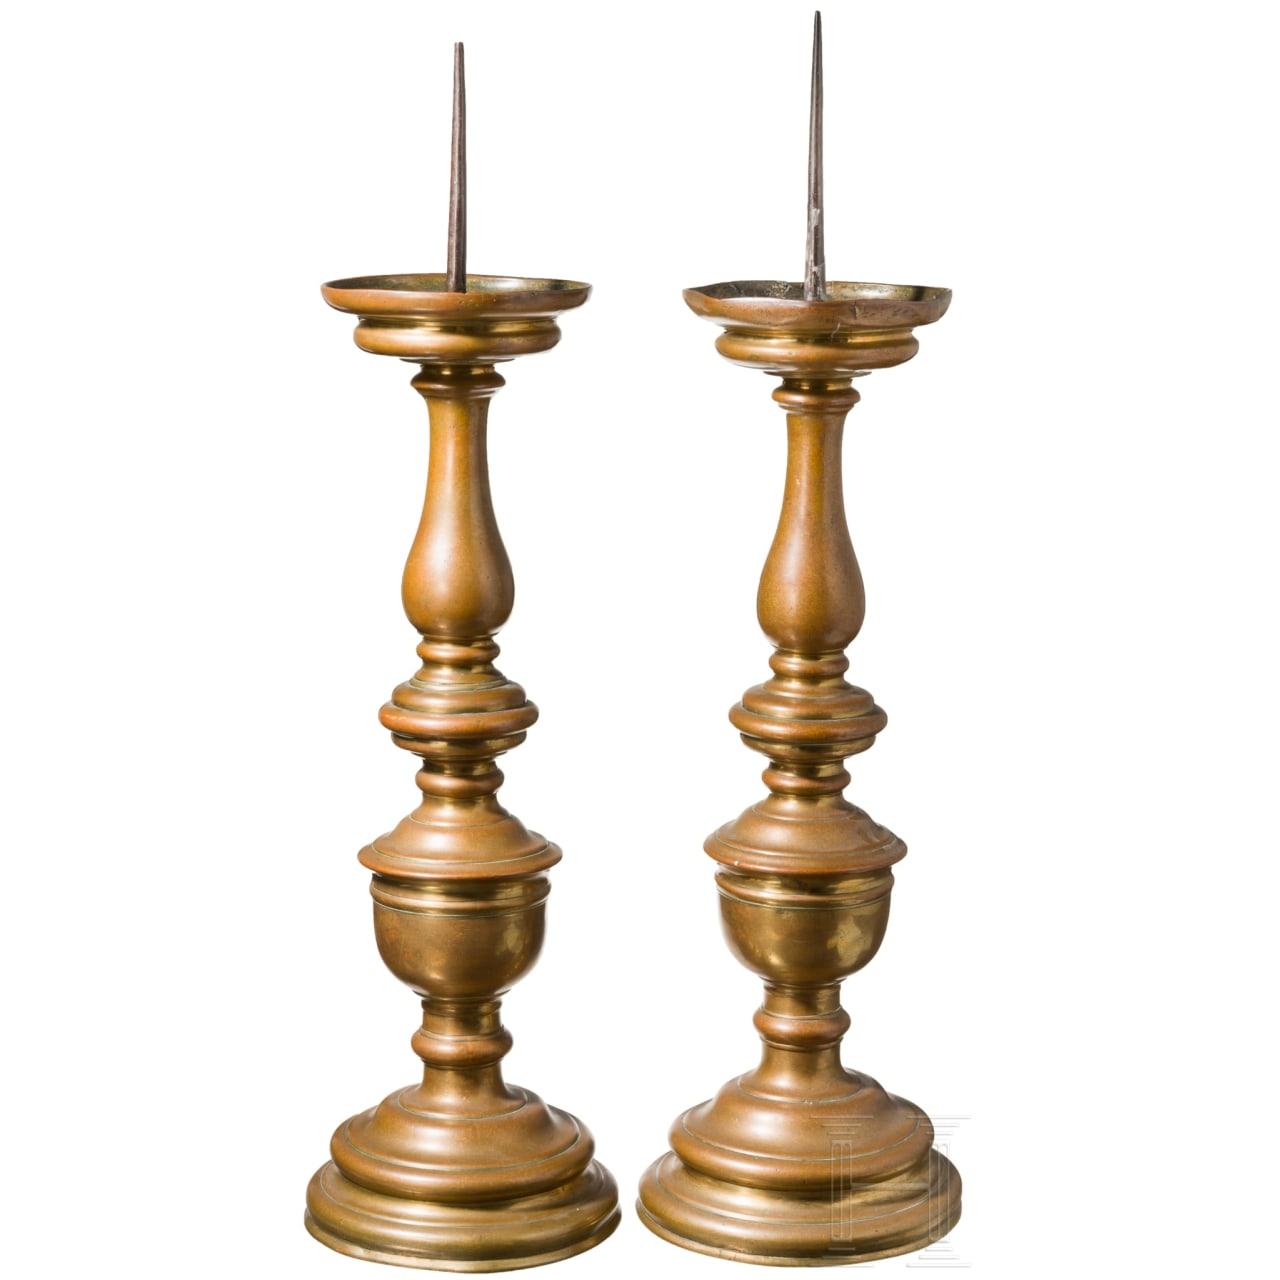 A pair of large Renaissance pricket-candlesticks, Nuremberg, circa 1560